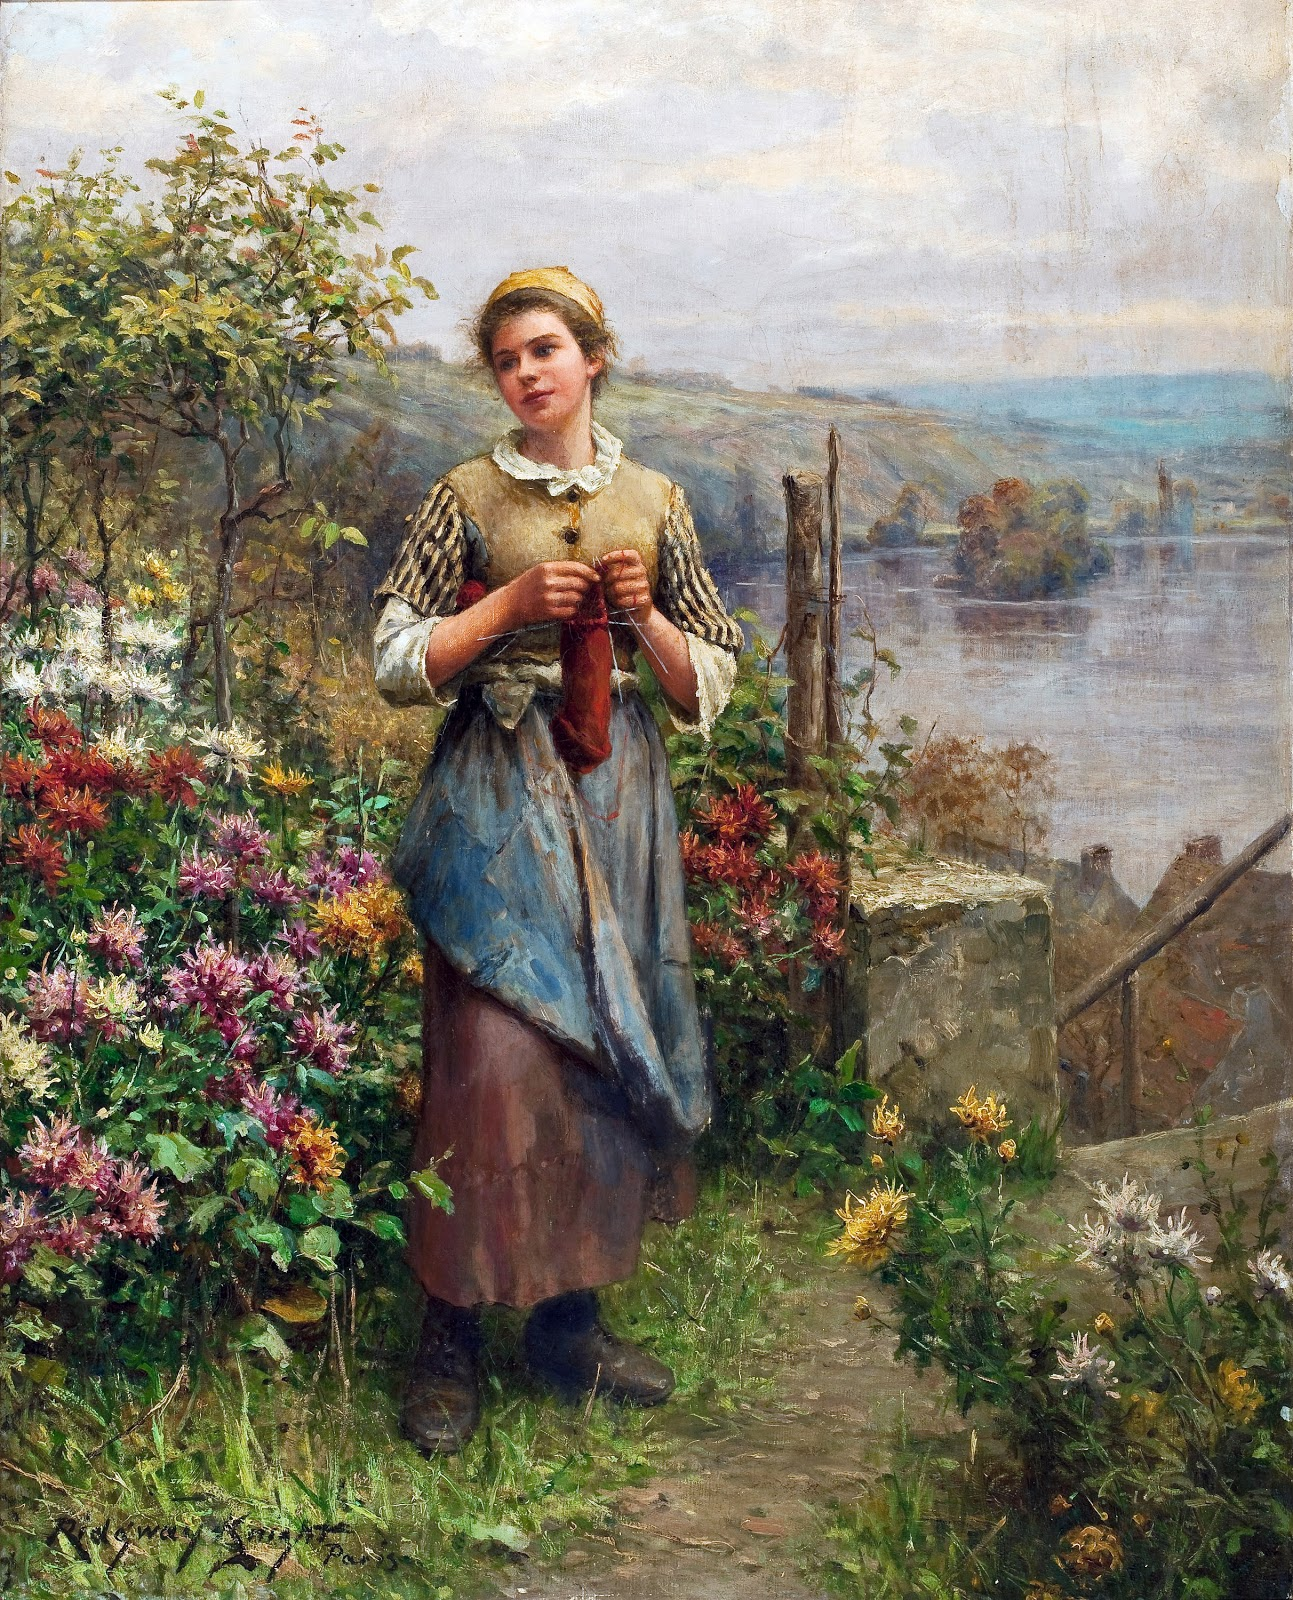 19th Century American Paintings: Daniel Ridgway Knight, Ctd